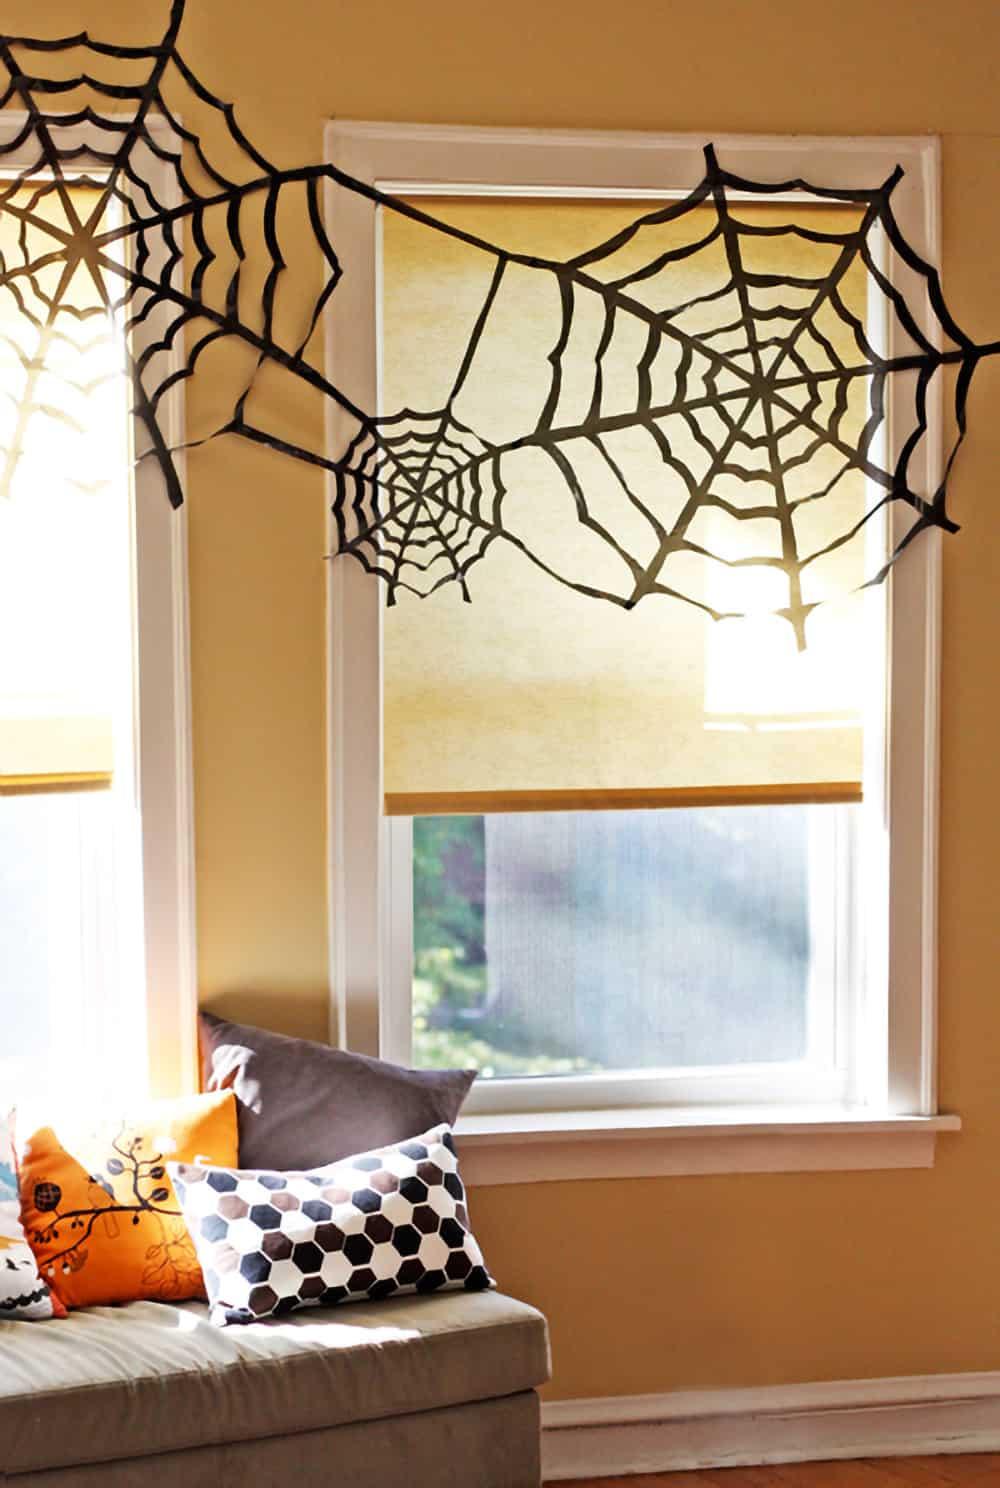 DIY trash bag spider webs as window decorations.